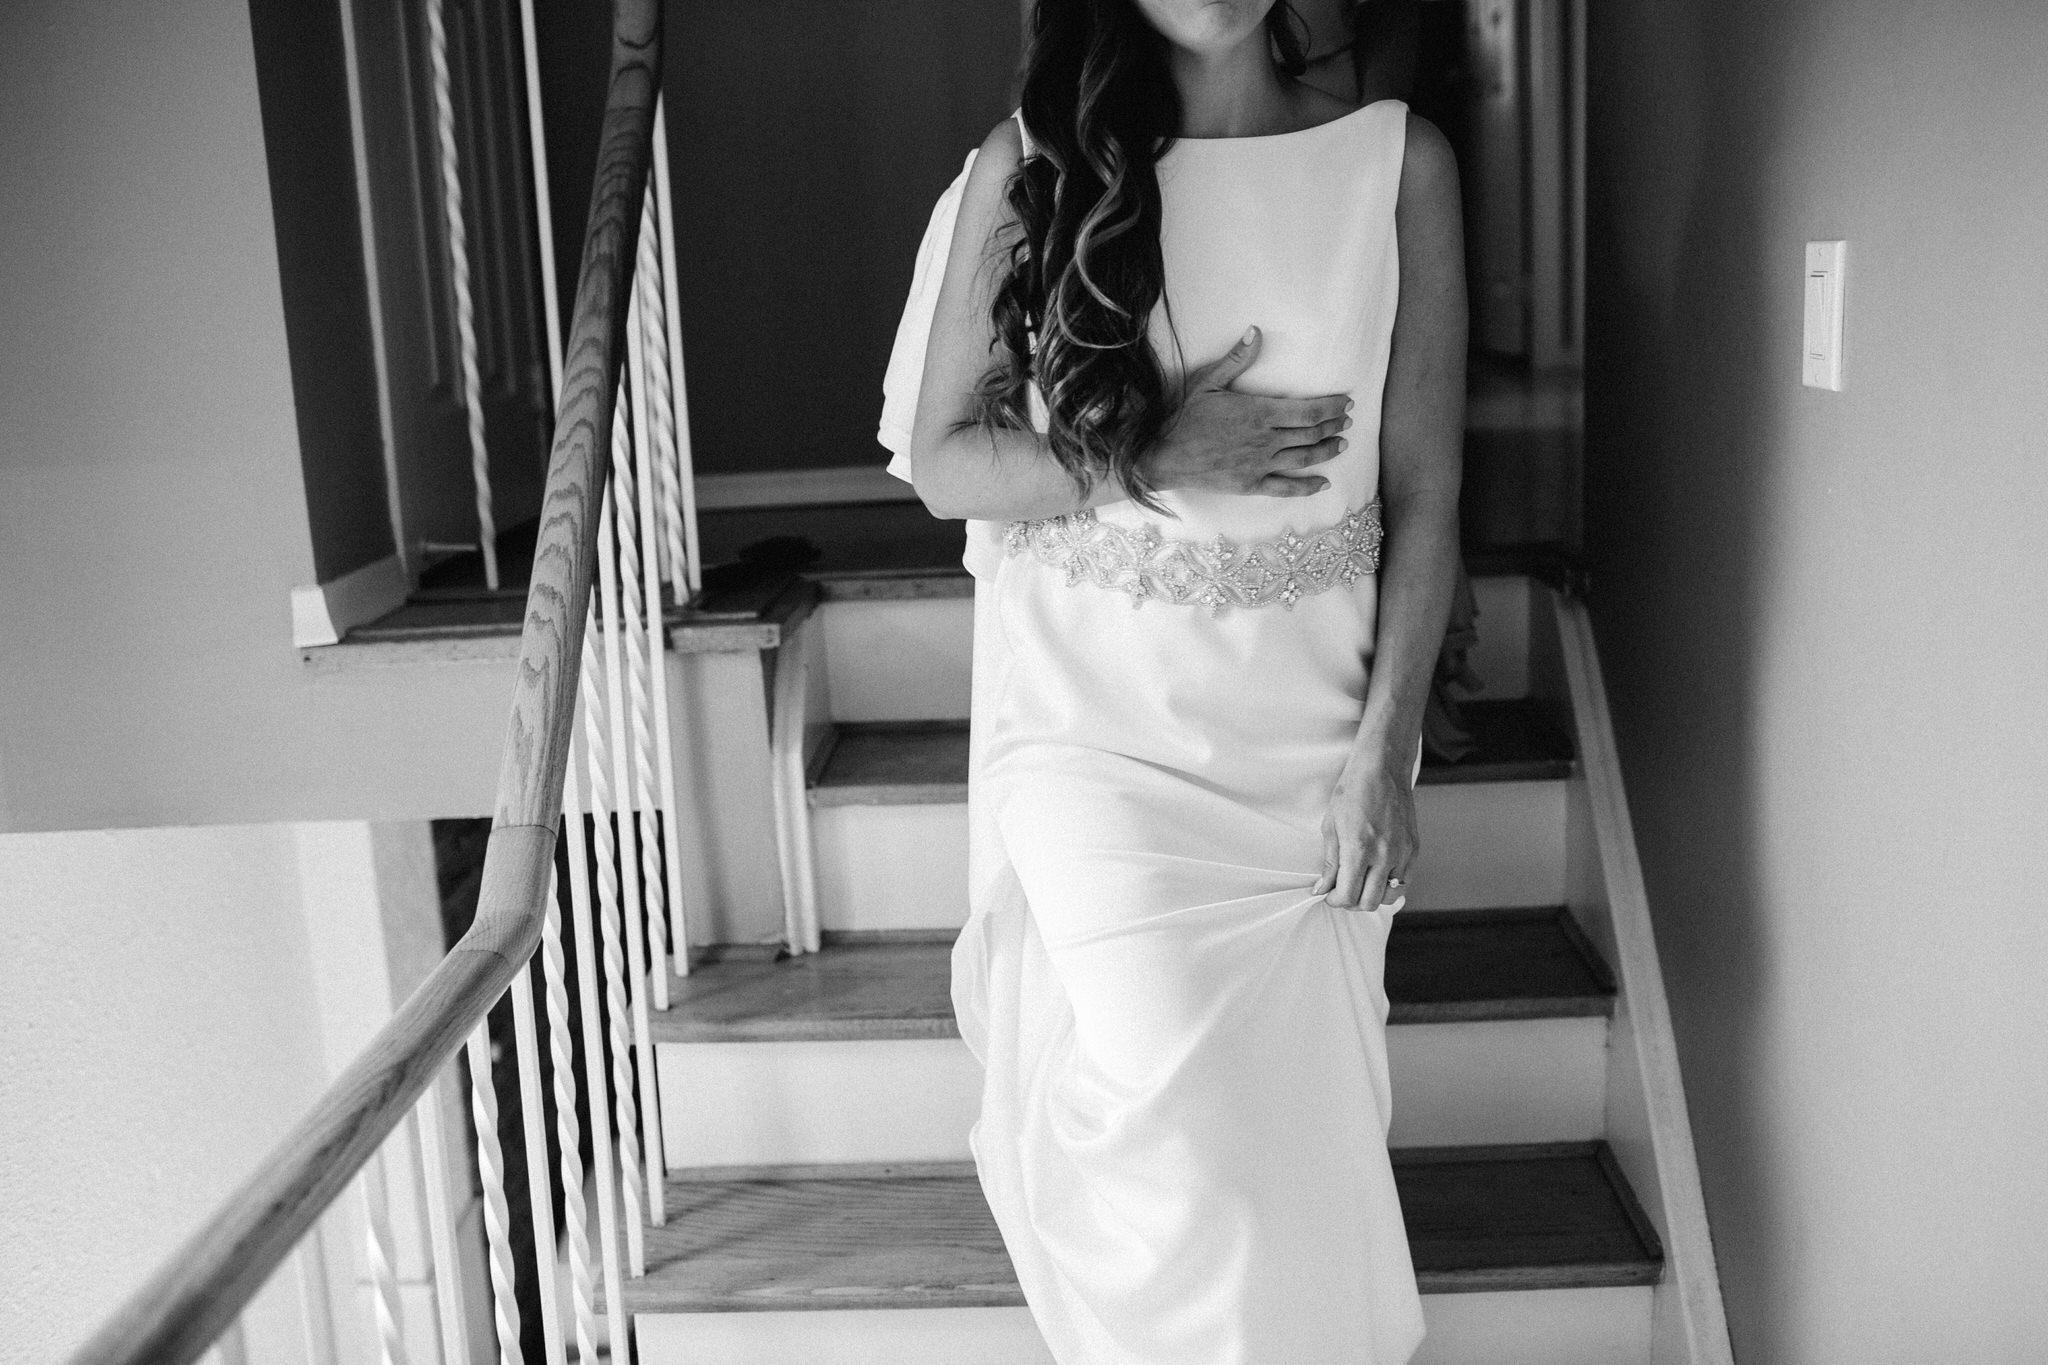 St. George Anglican Oshawa, Toronto wedding photographer, parkwood estates oshawa, bride details, bride getting ready